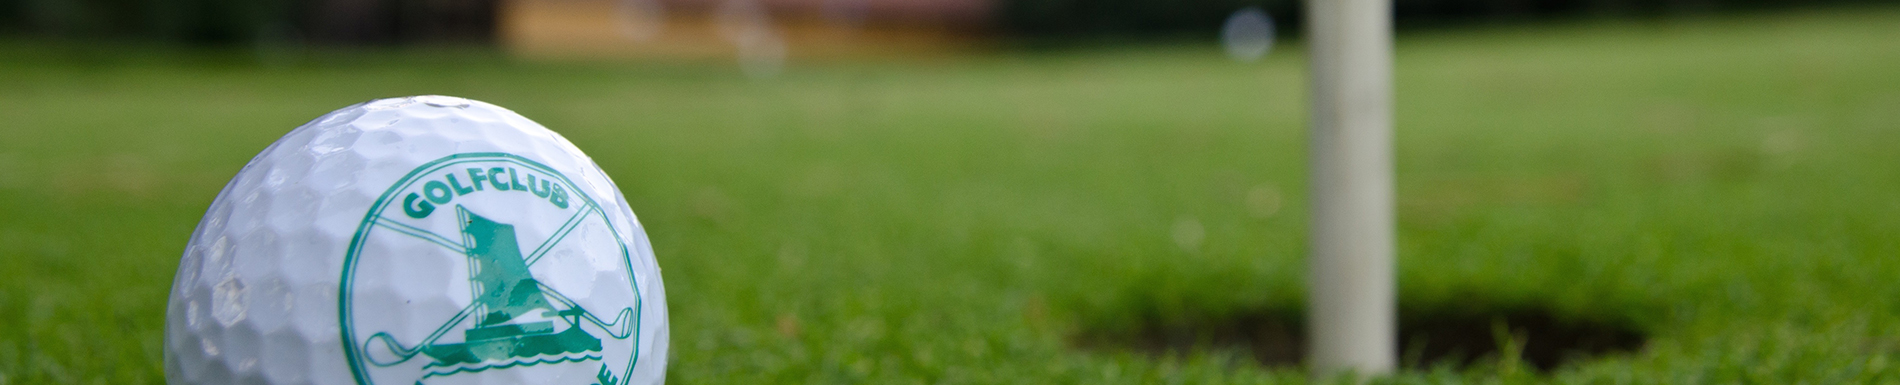 20130906_golfclub_worpswede-64-header